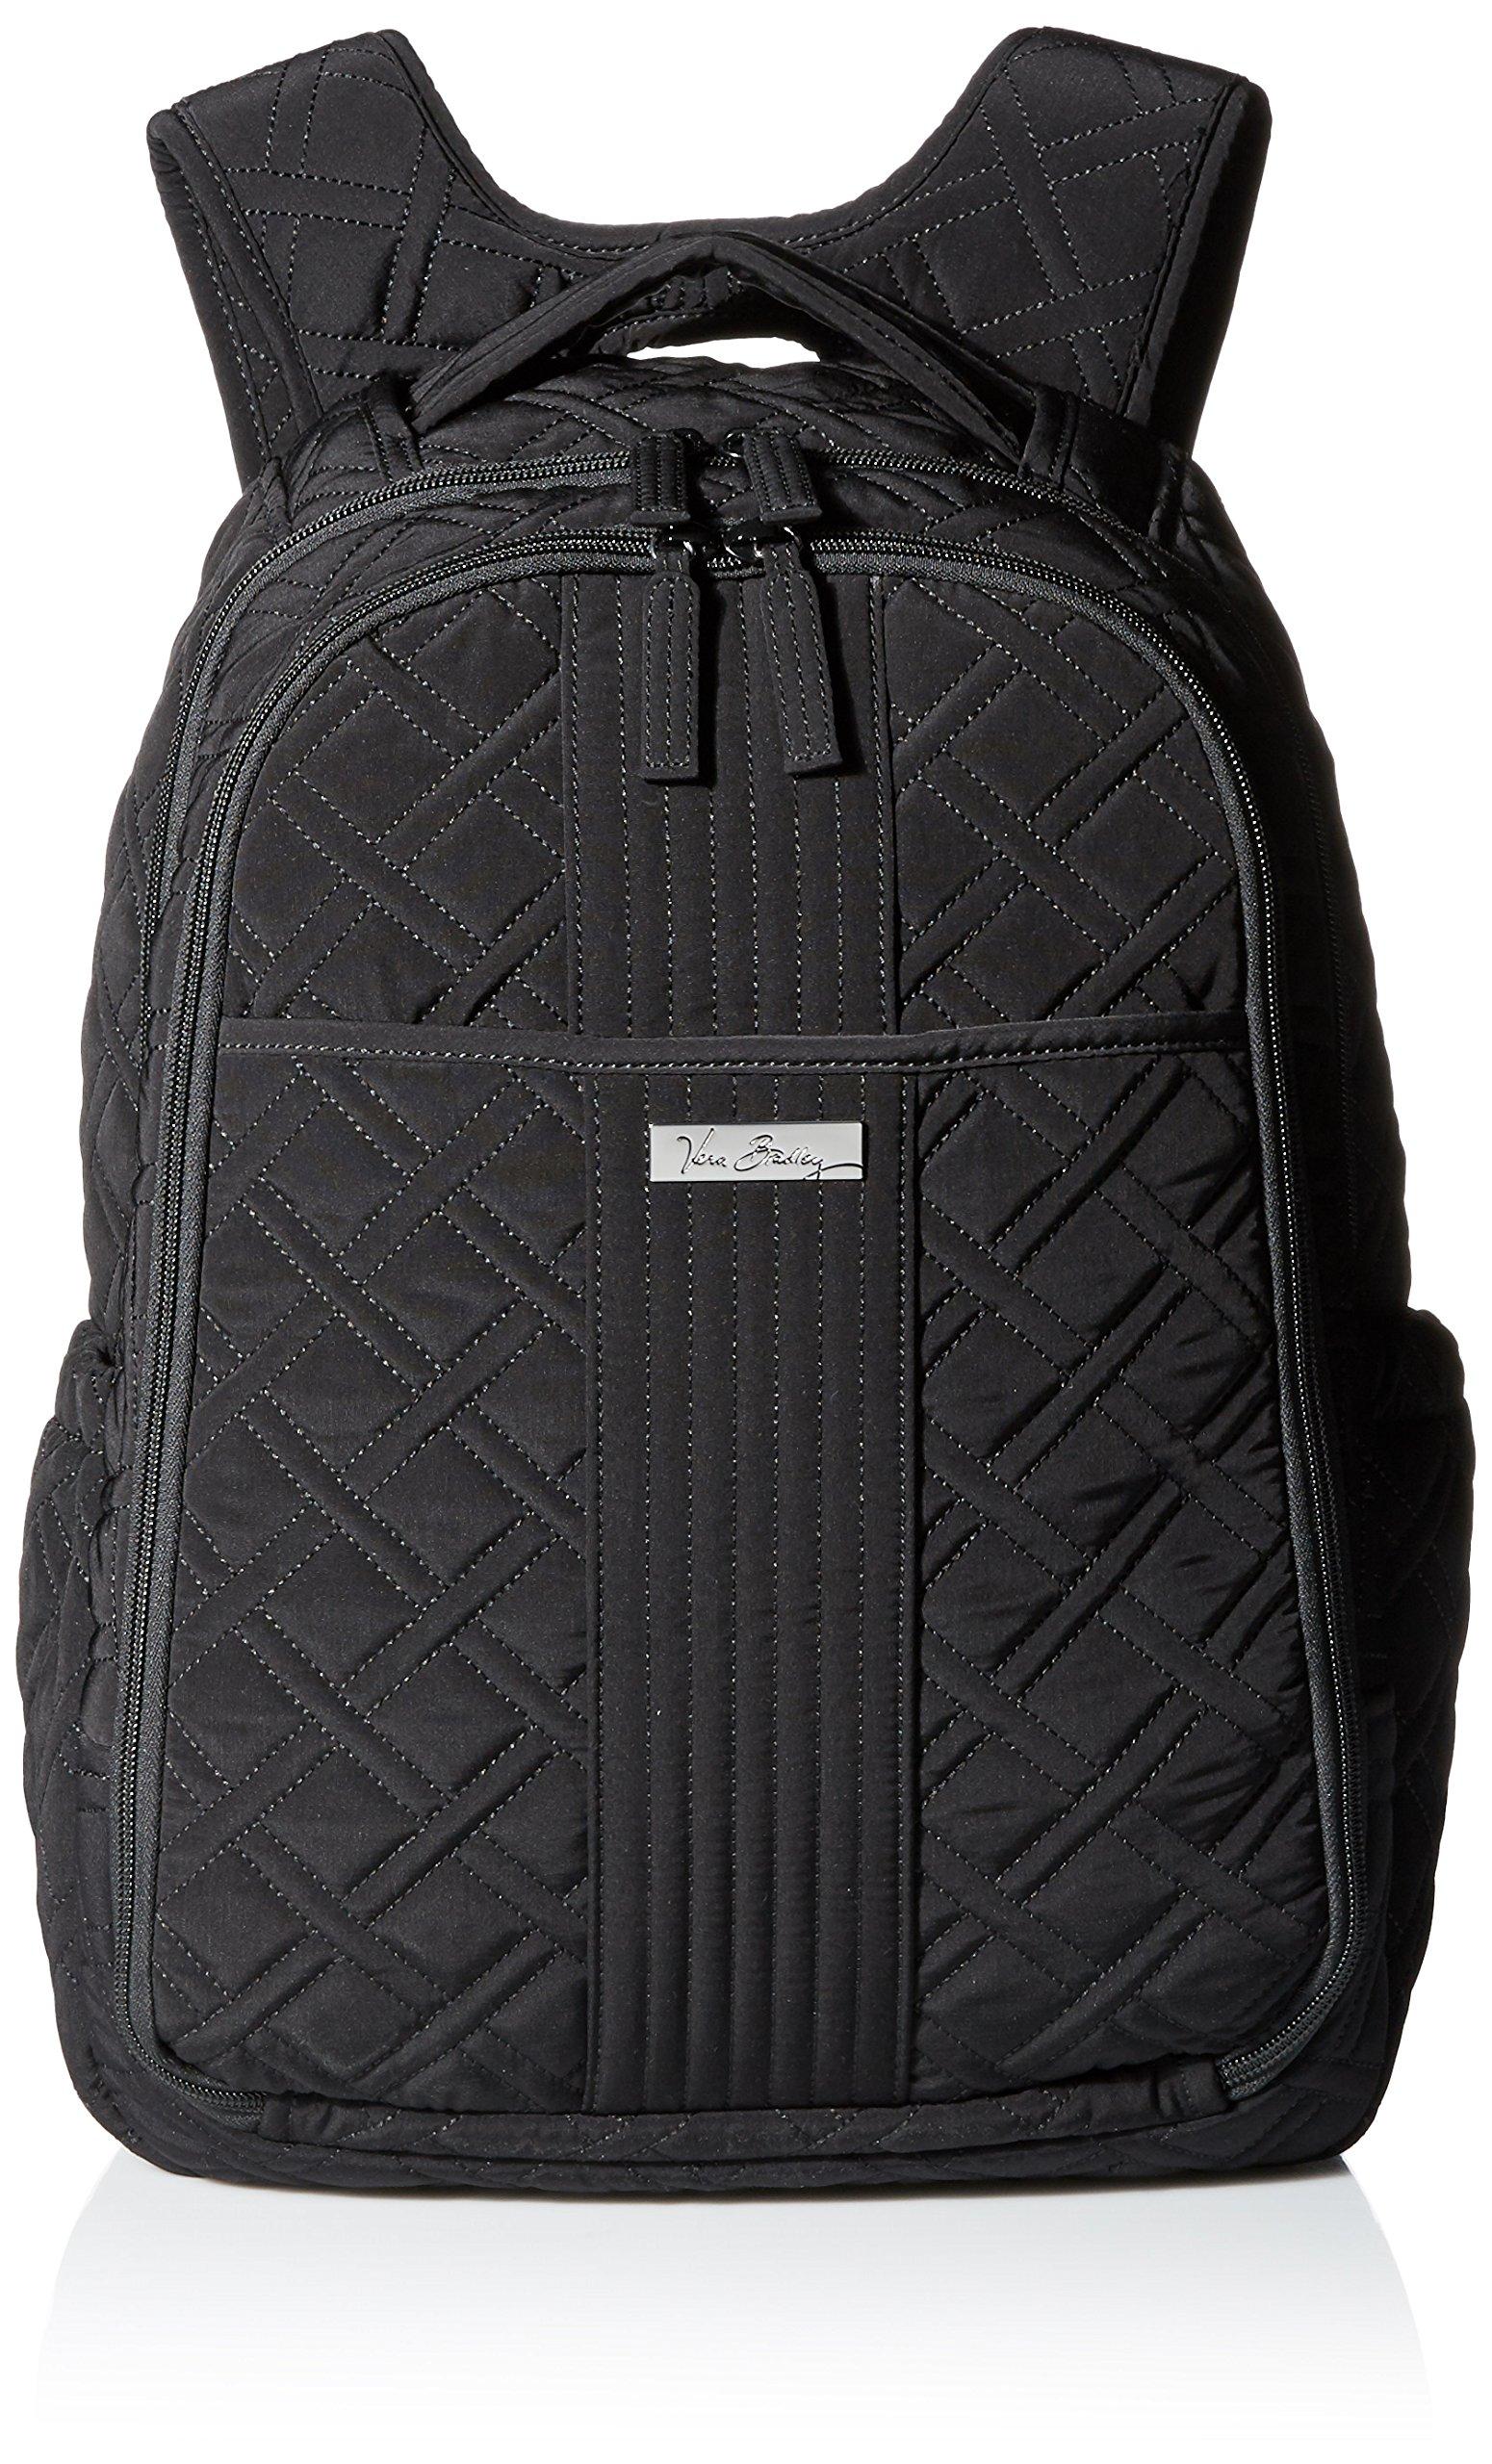 Vera Bradley Baby Backpack, Classic Black, One Size